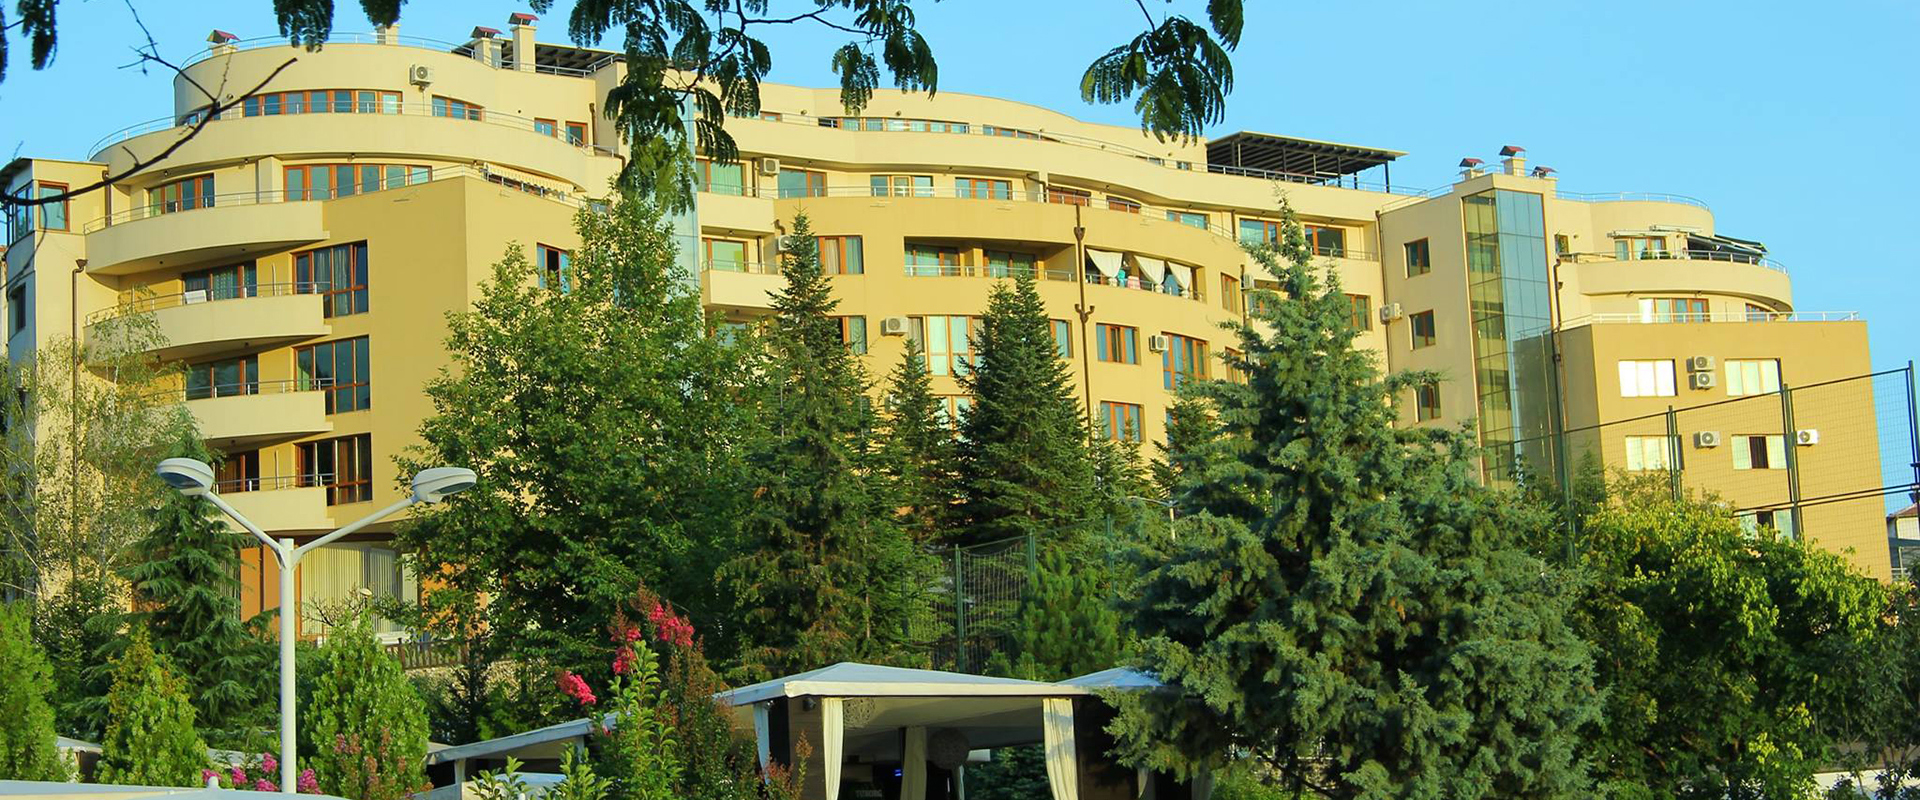 Botanica Family Hotel Sandanski Bulgaria All Year Vacations